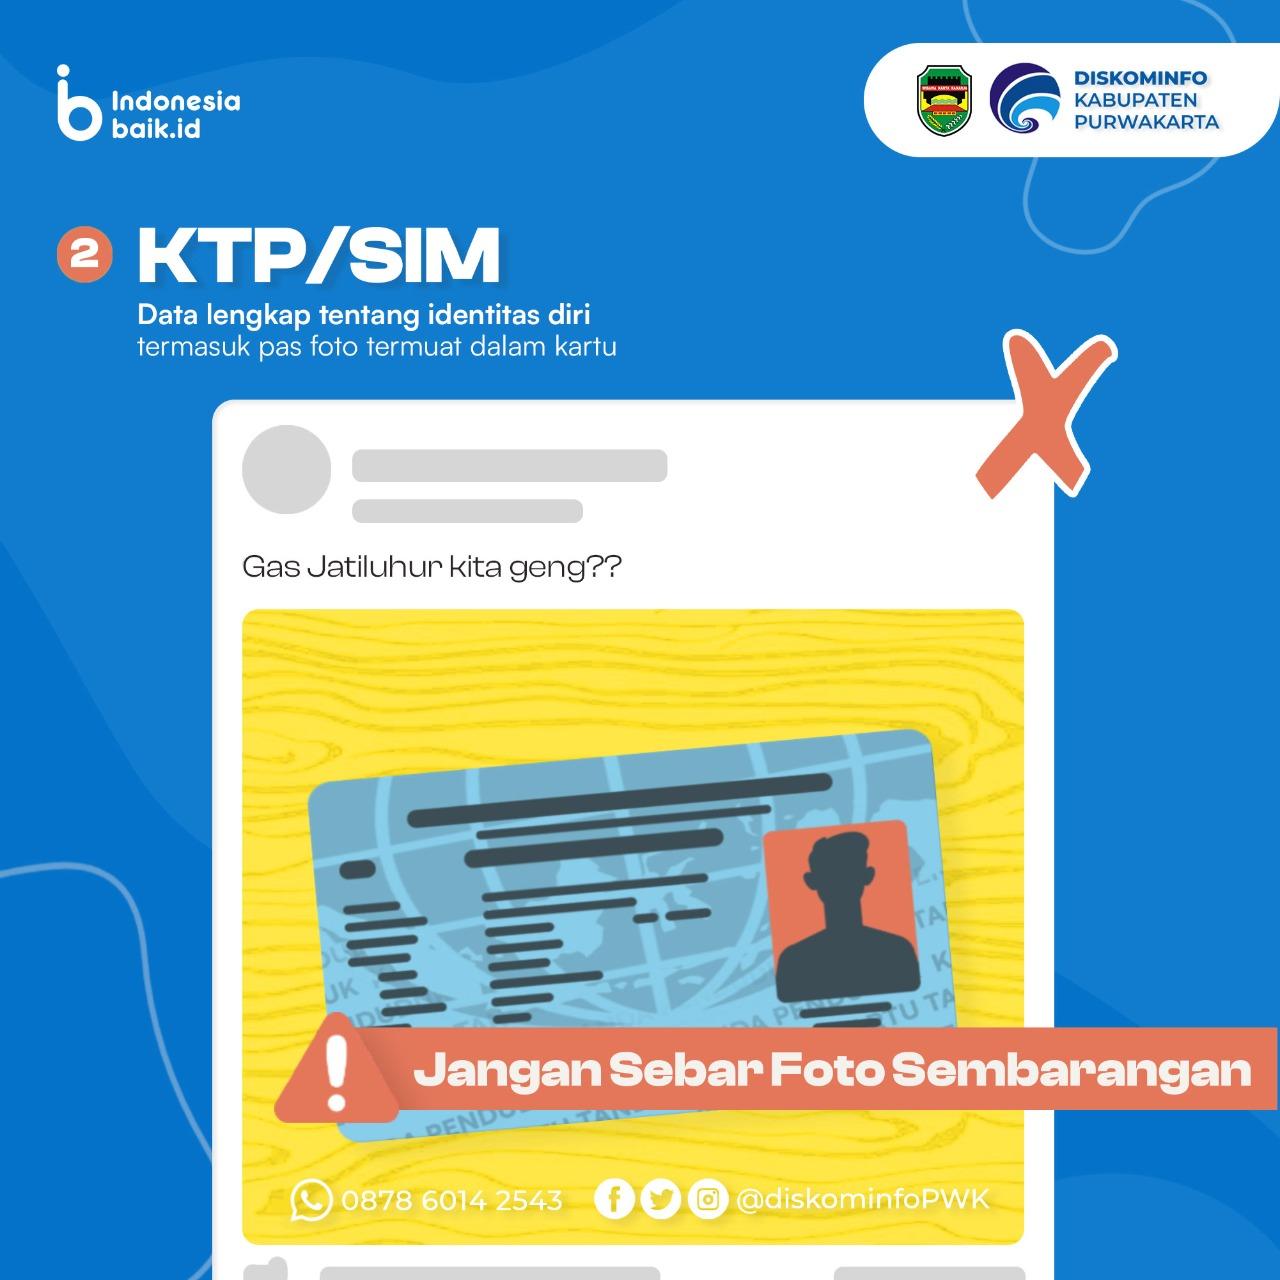 KTP/SIM